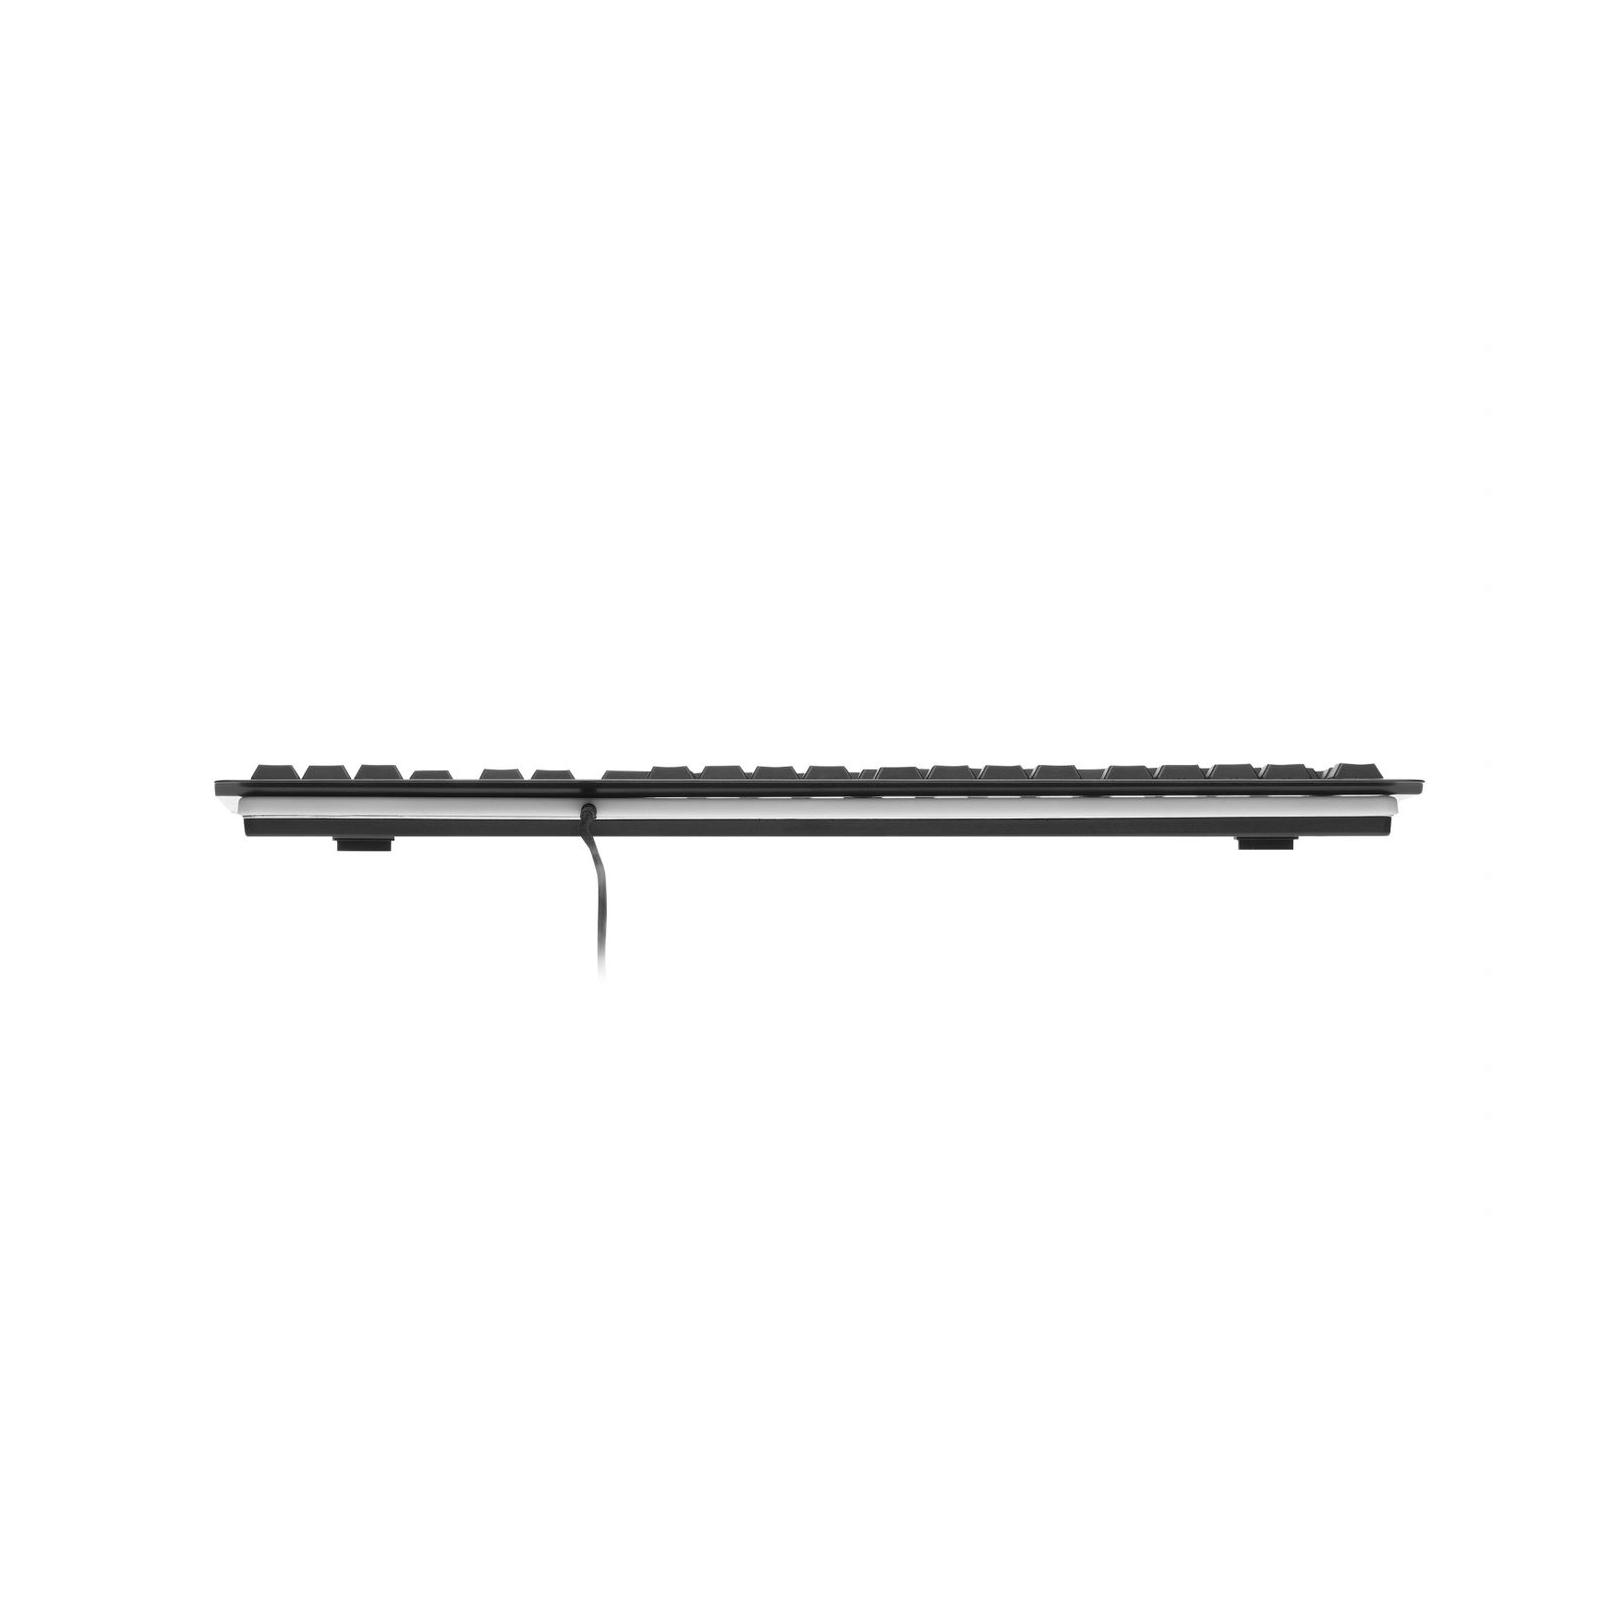 Клавіатура 2E KG320 LED USB Black Ukr (2E-KG320UB) зображення 3